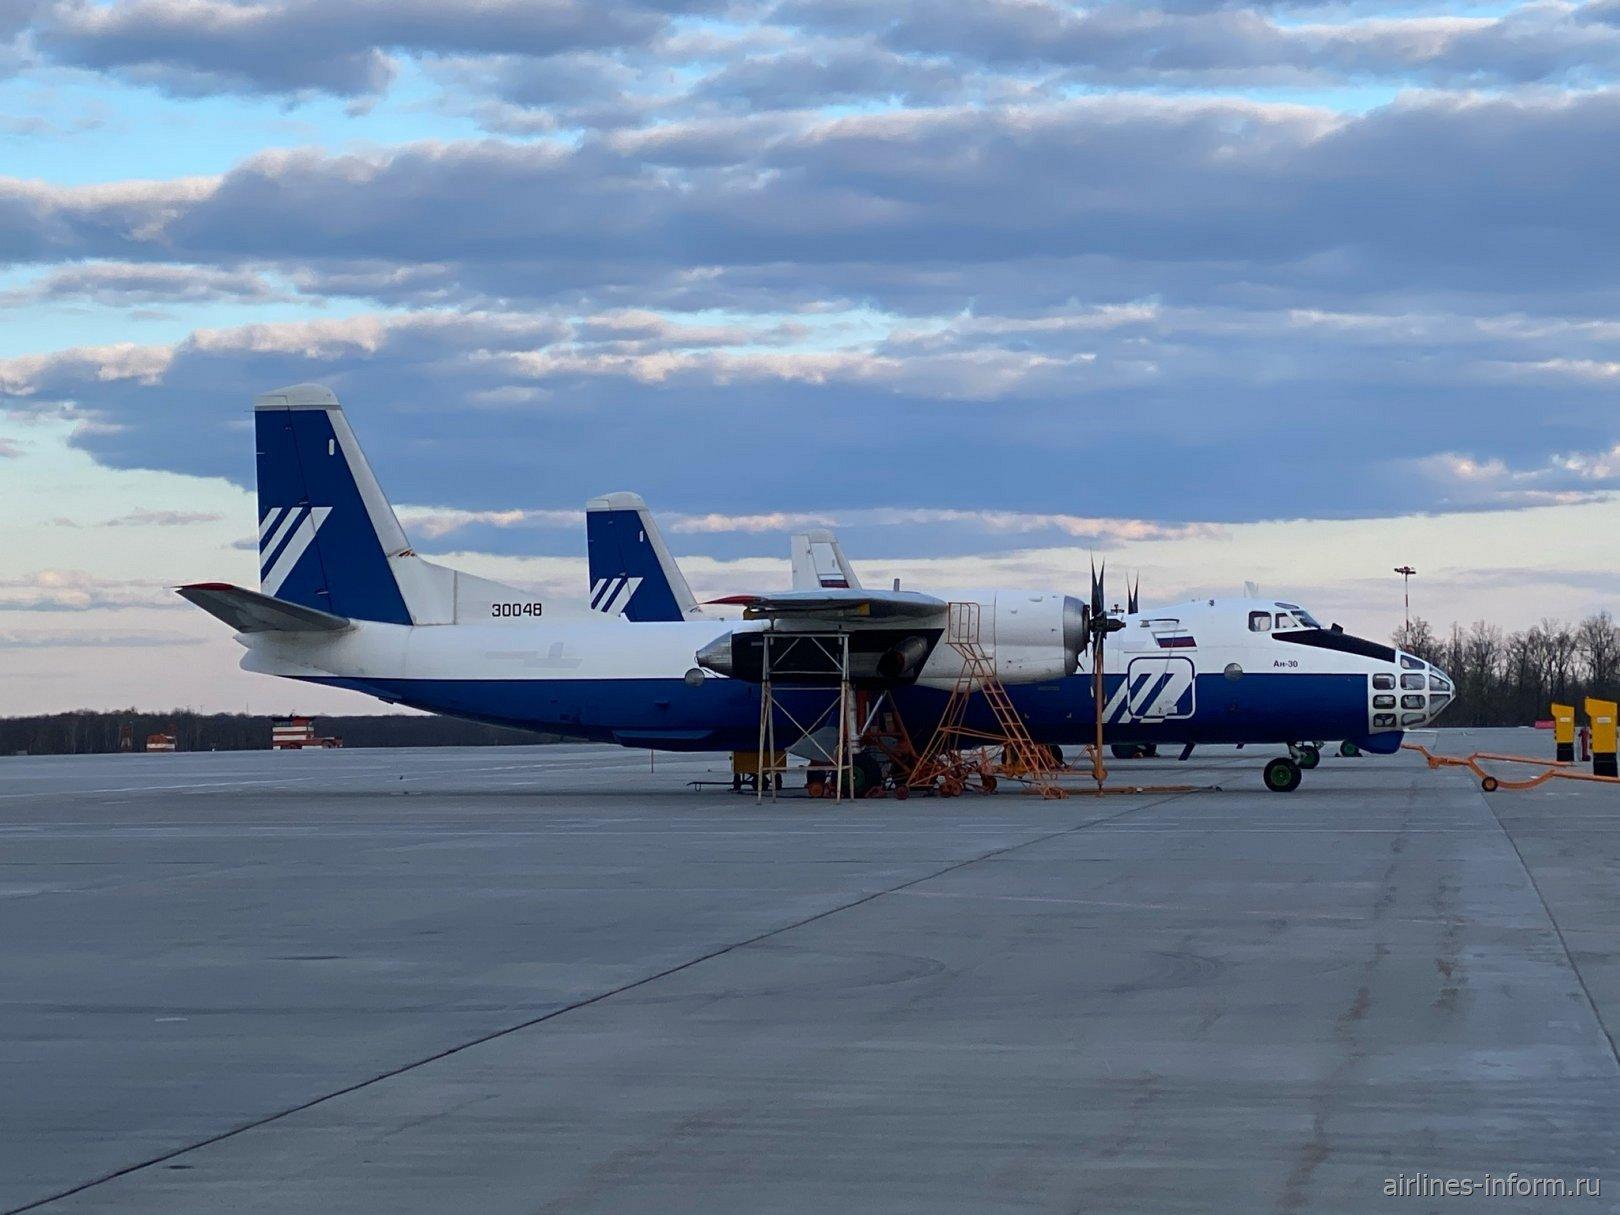 Самолеты Ан-30 на перроне аэропорта Воронеж